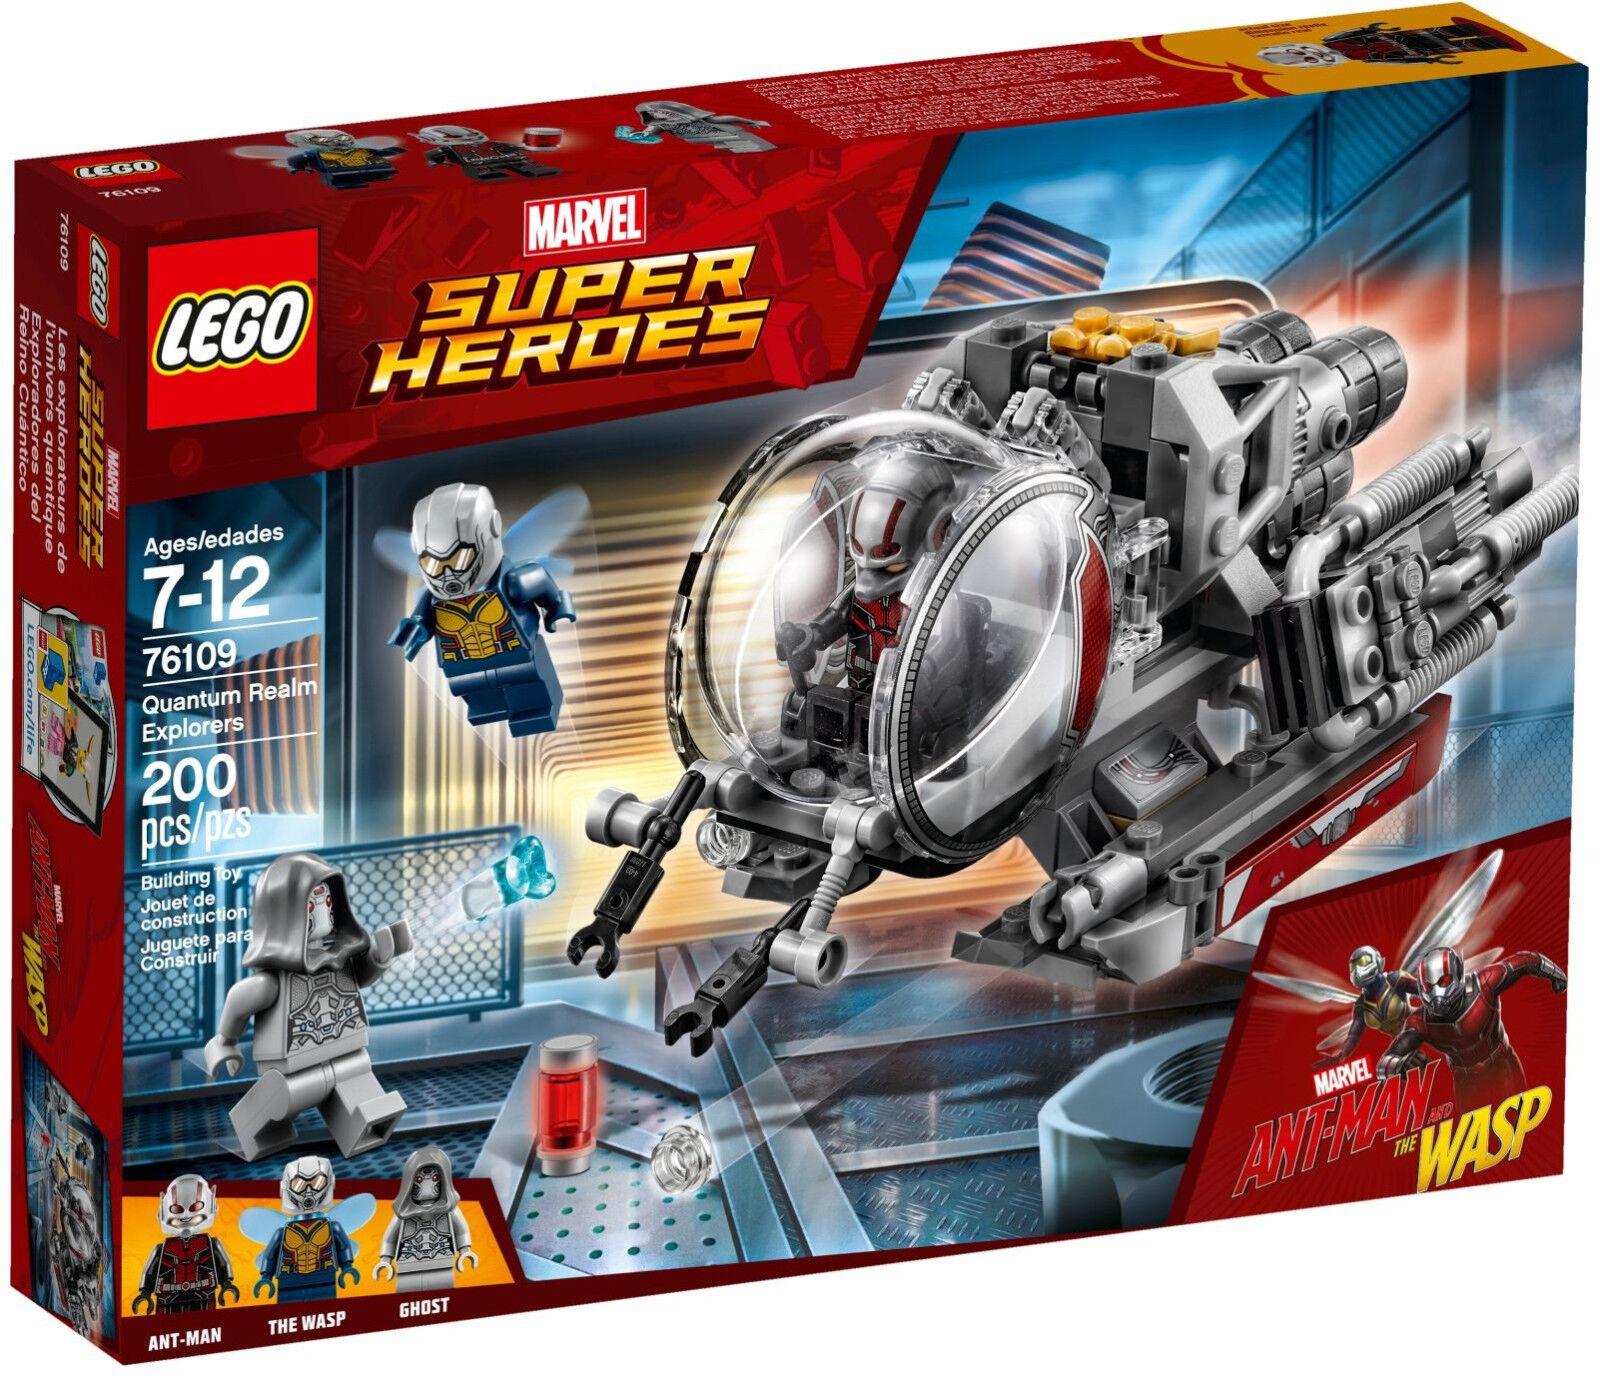 Lego Marvel Super Heroes-Ant-Man 76109 exploradores del quantenreichs-nuevo embalaje original